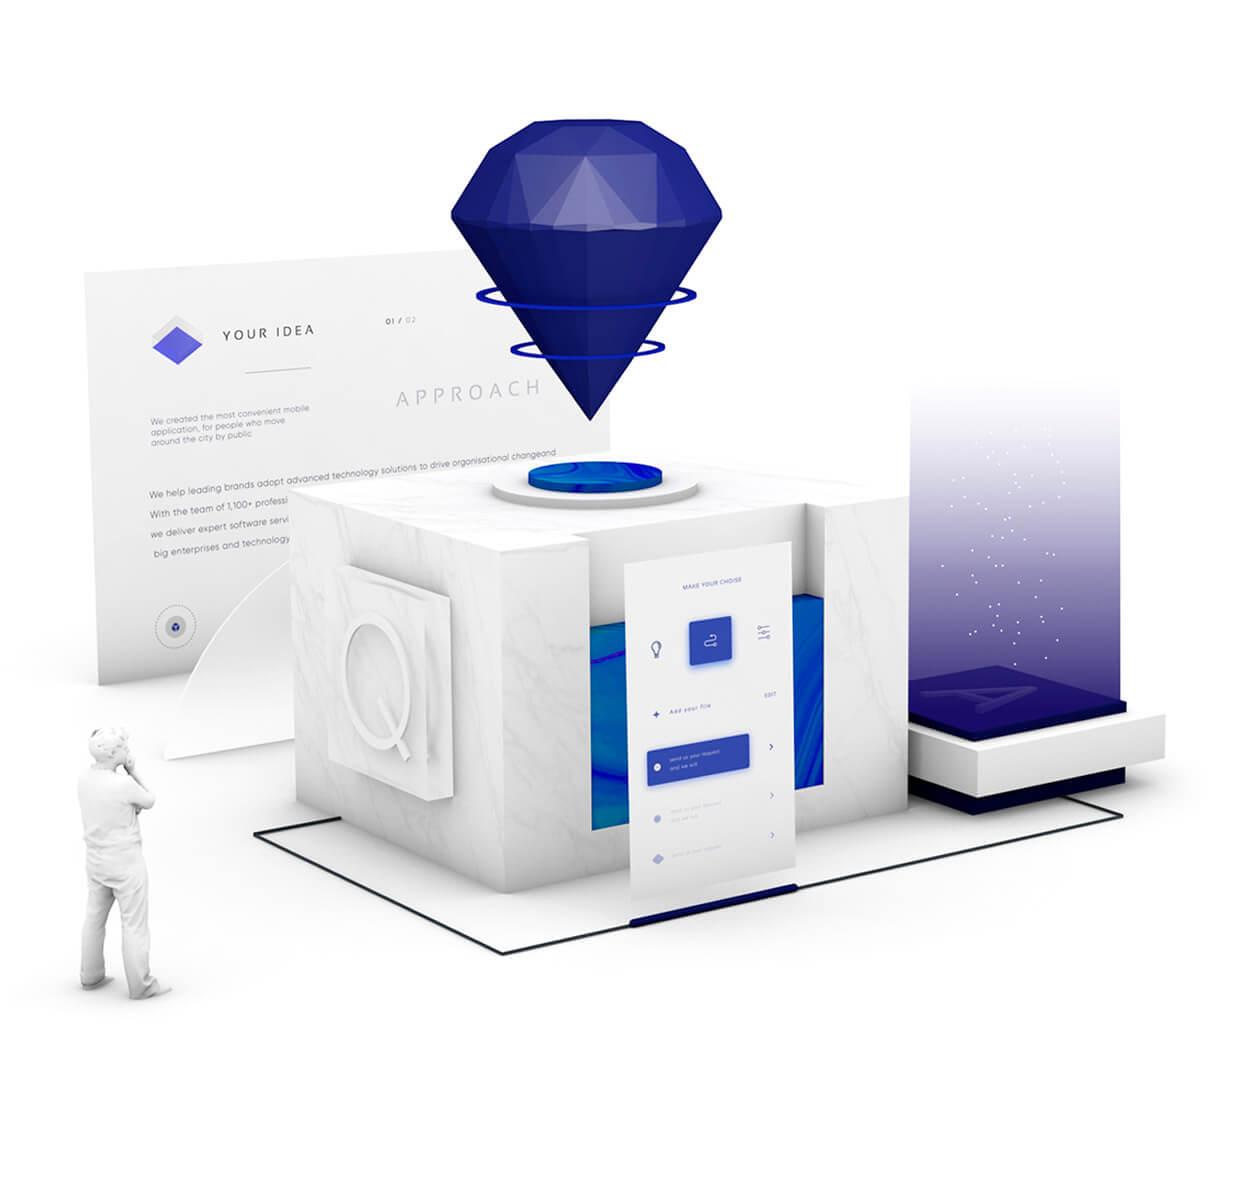 Quality Assurance Services blue gem, white database